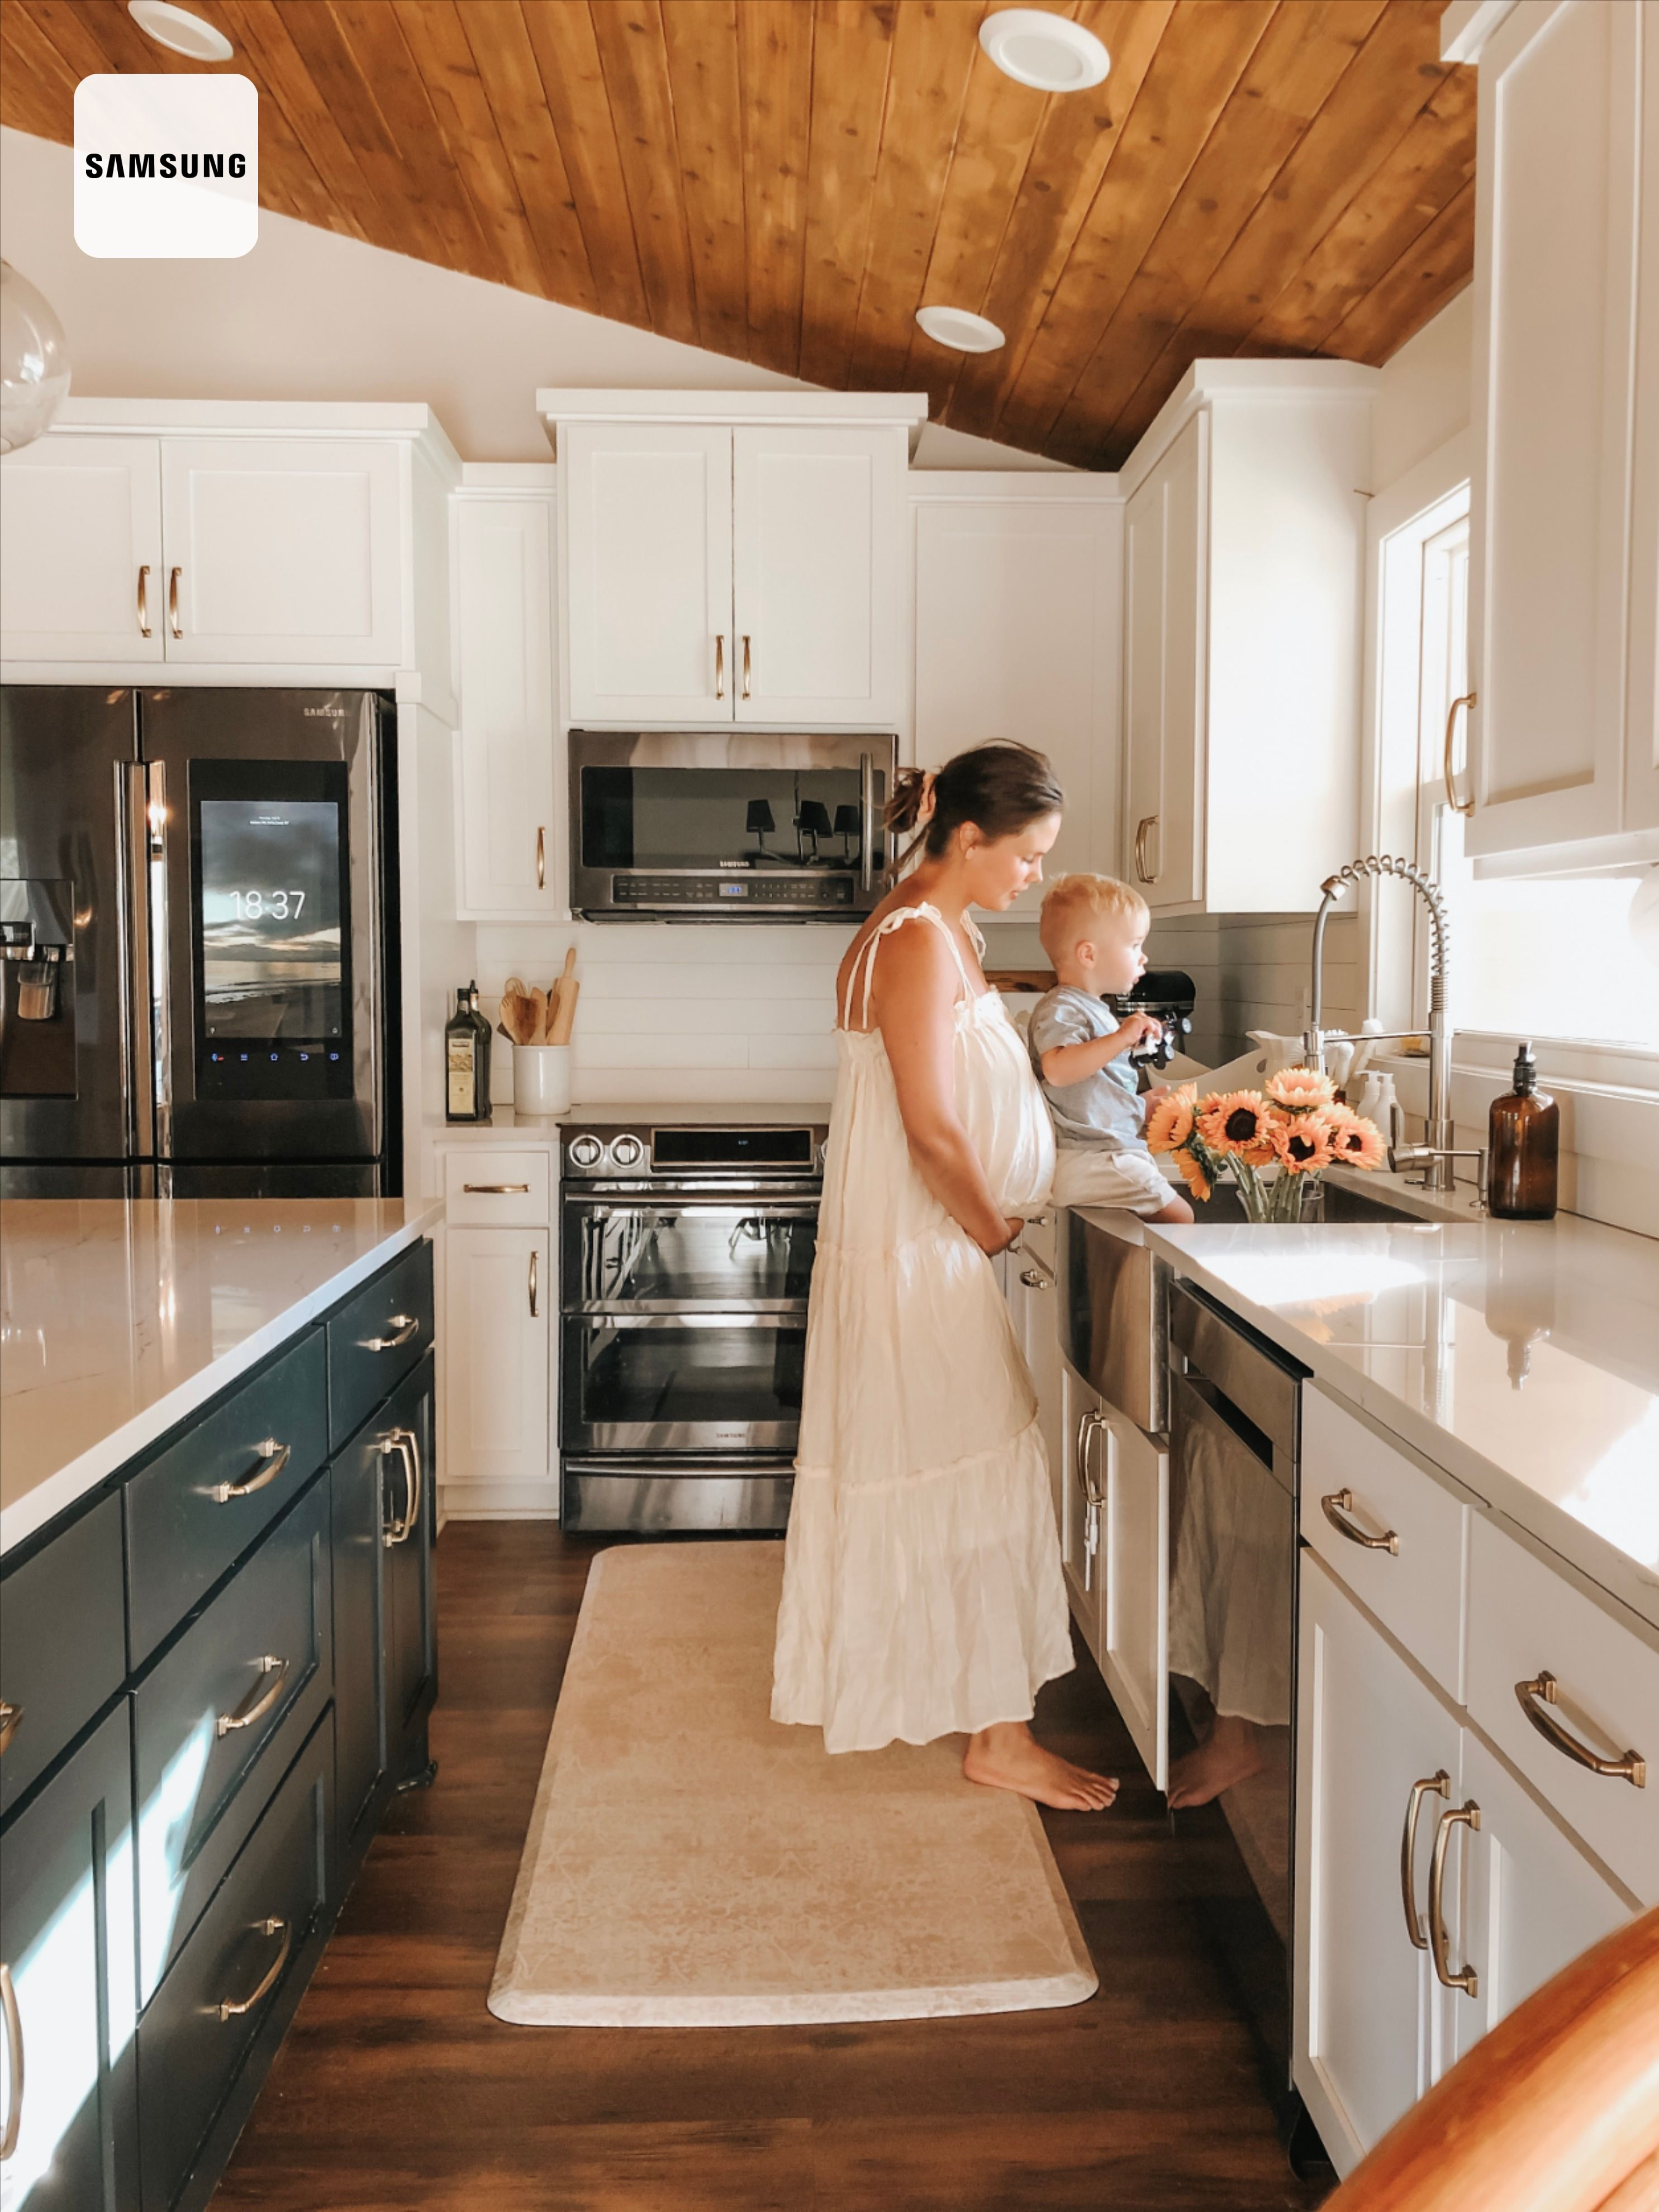 White and Green Kitchen in 2020 Green kitchen